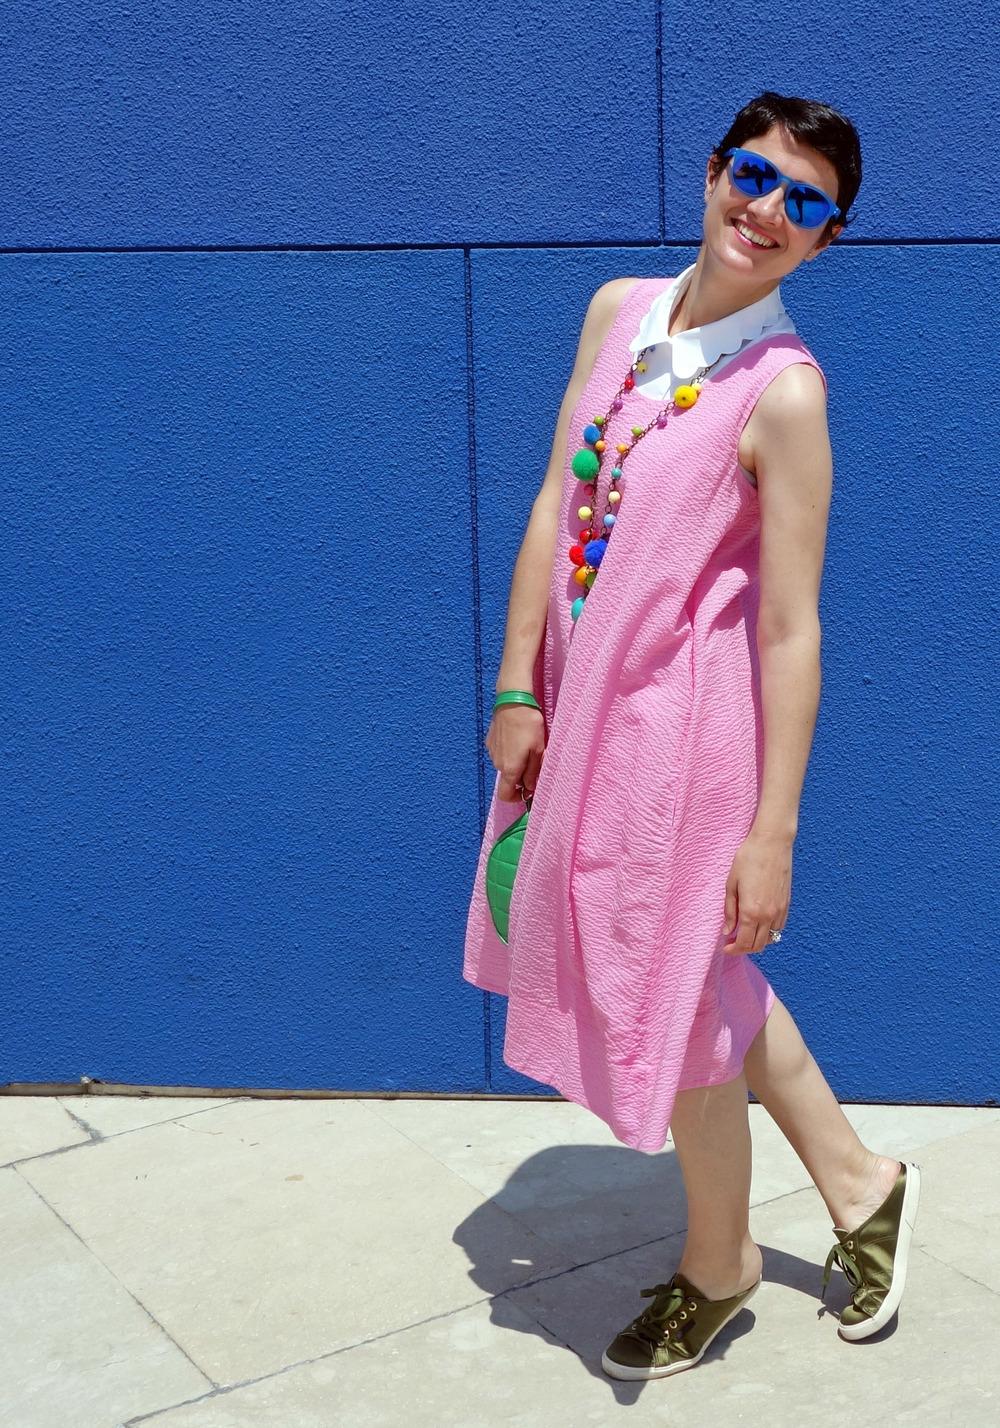 Back_To_Trendy_Pink_Dress_Blue_Sunglasses_Highfly_3.JPG